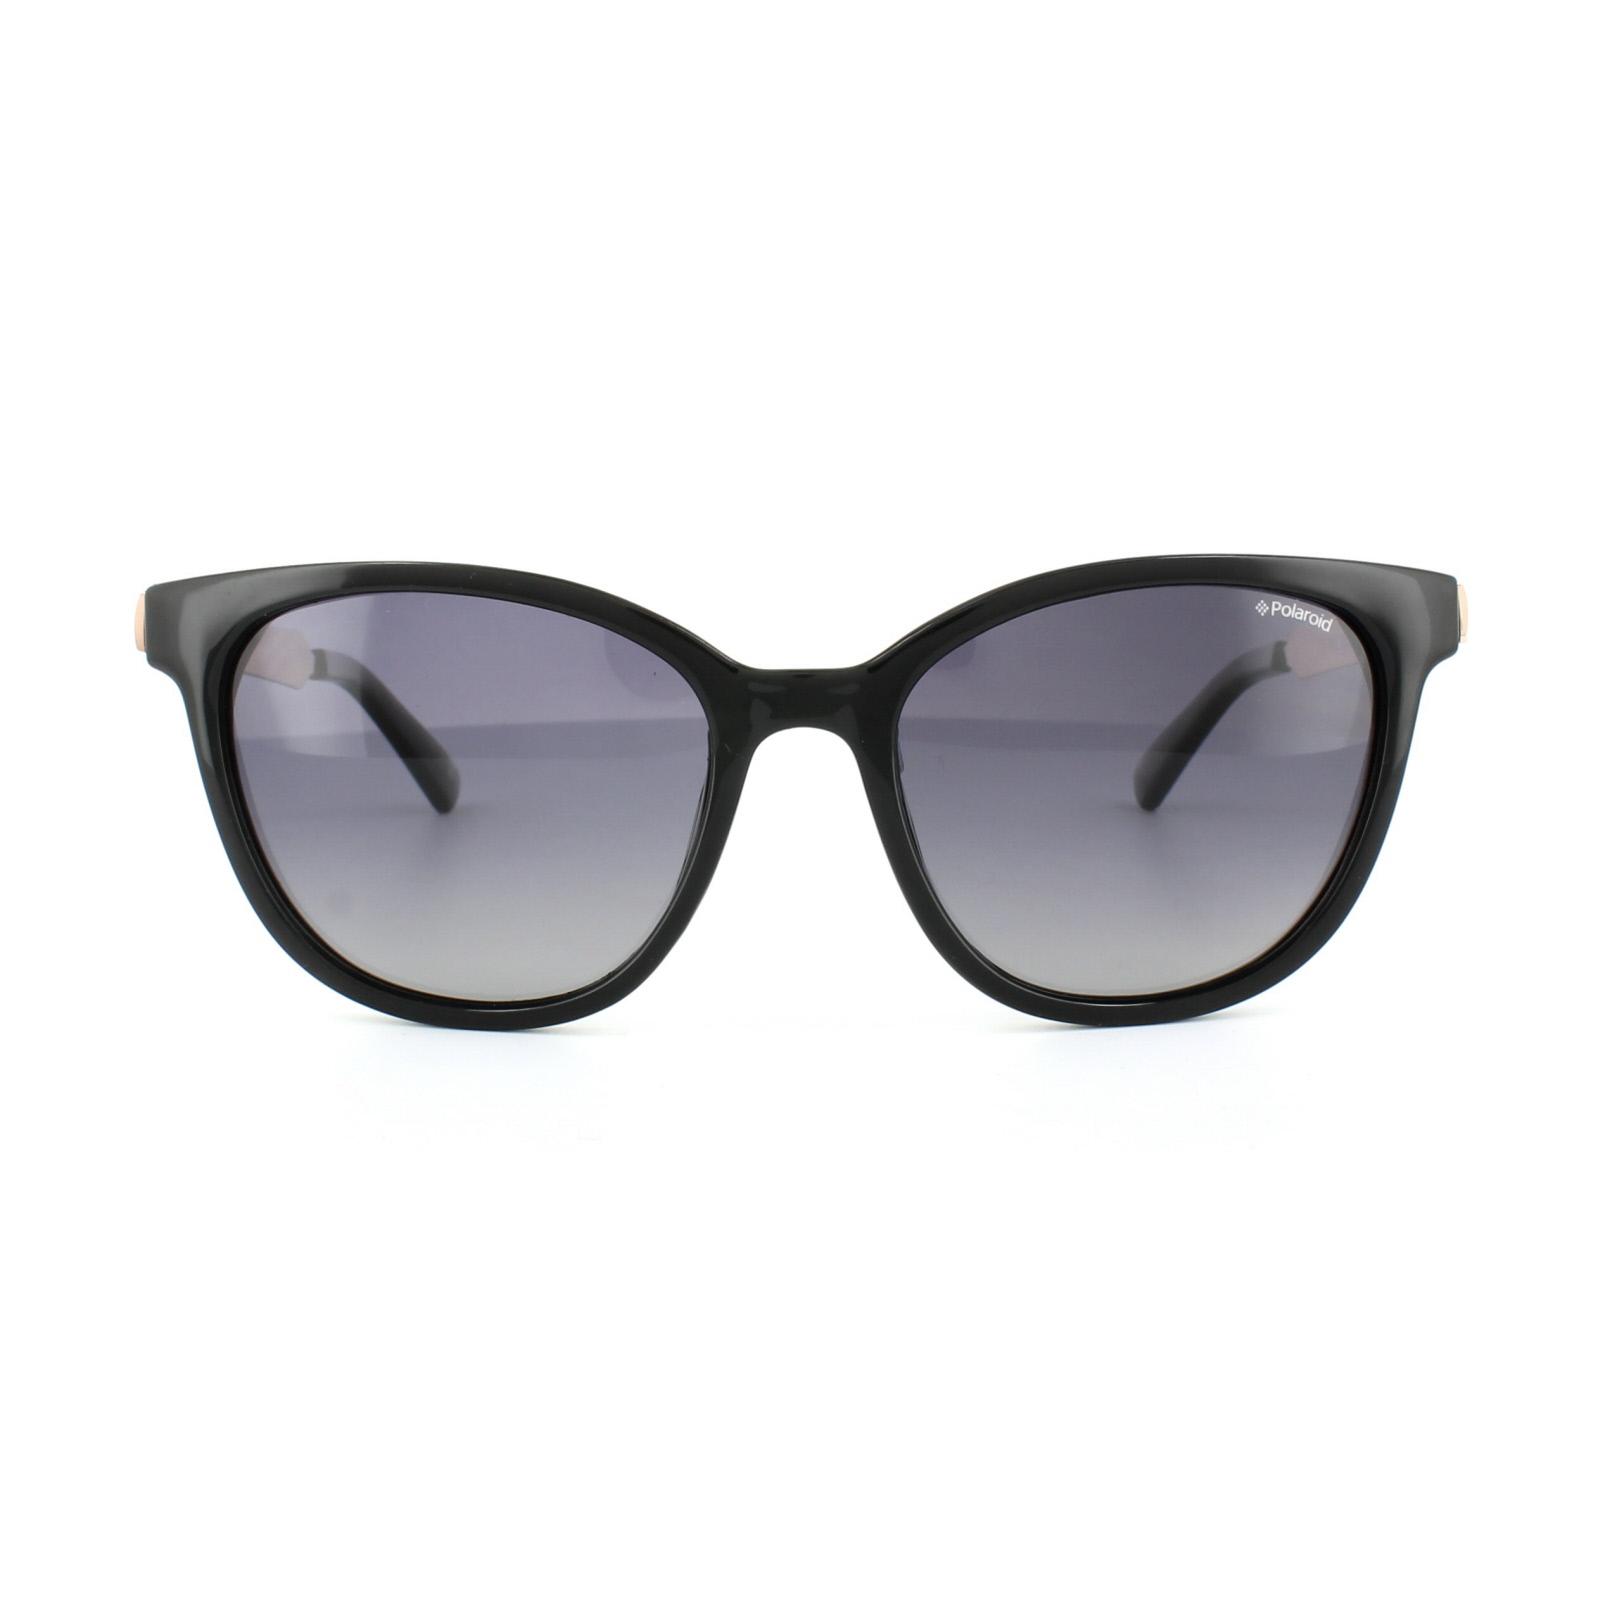 Polaroid PLD 5015S BMB IX Sonnenbrille Damenbrille Polarized Whw5RaK